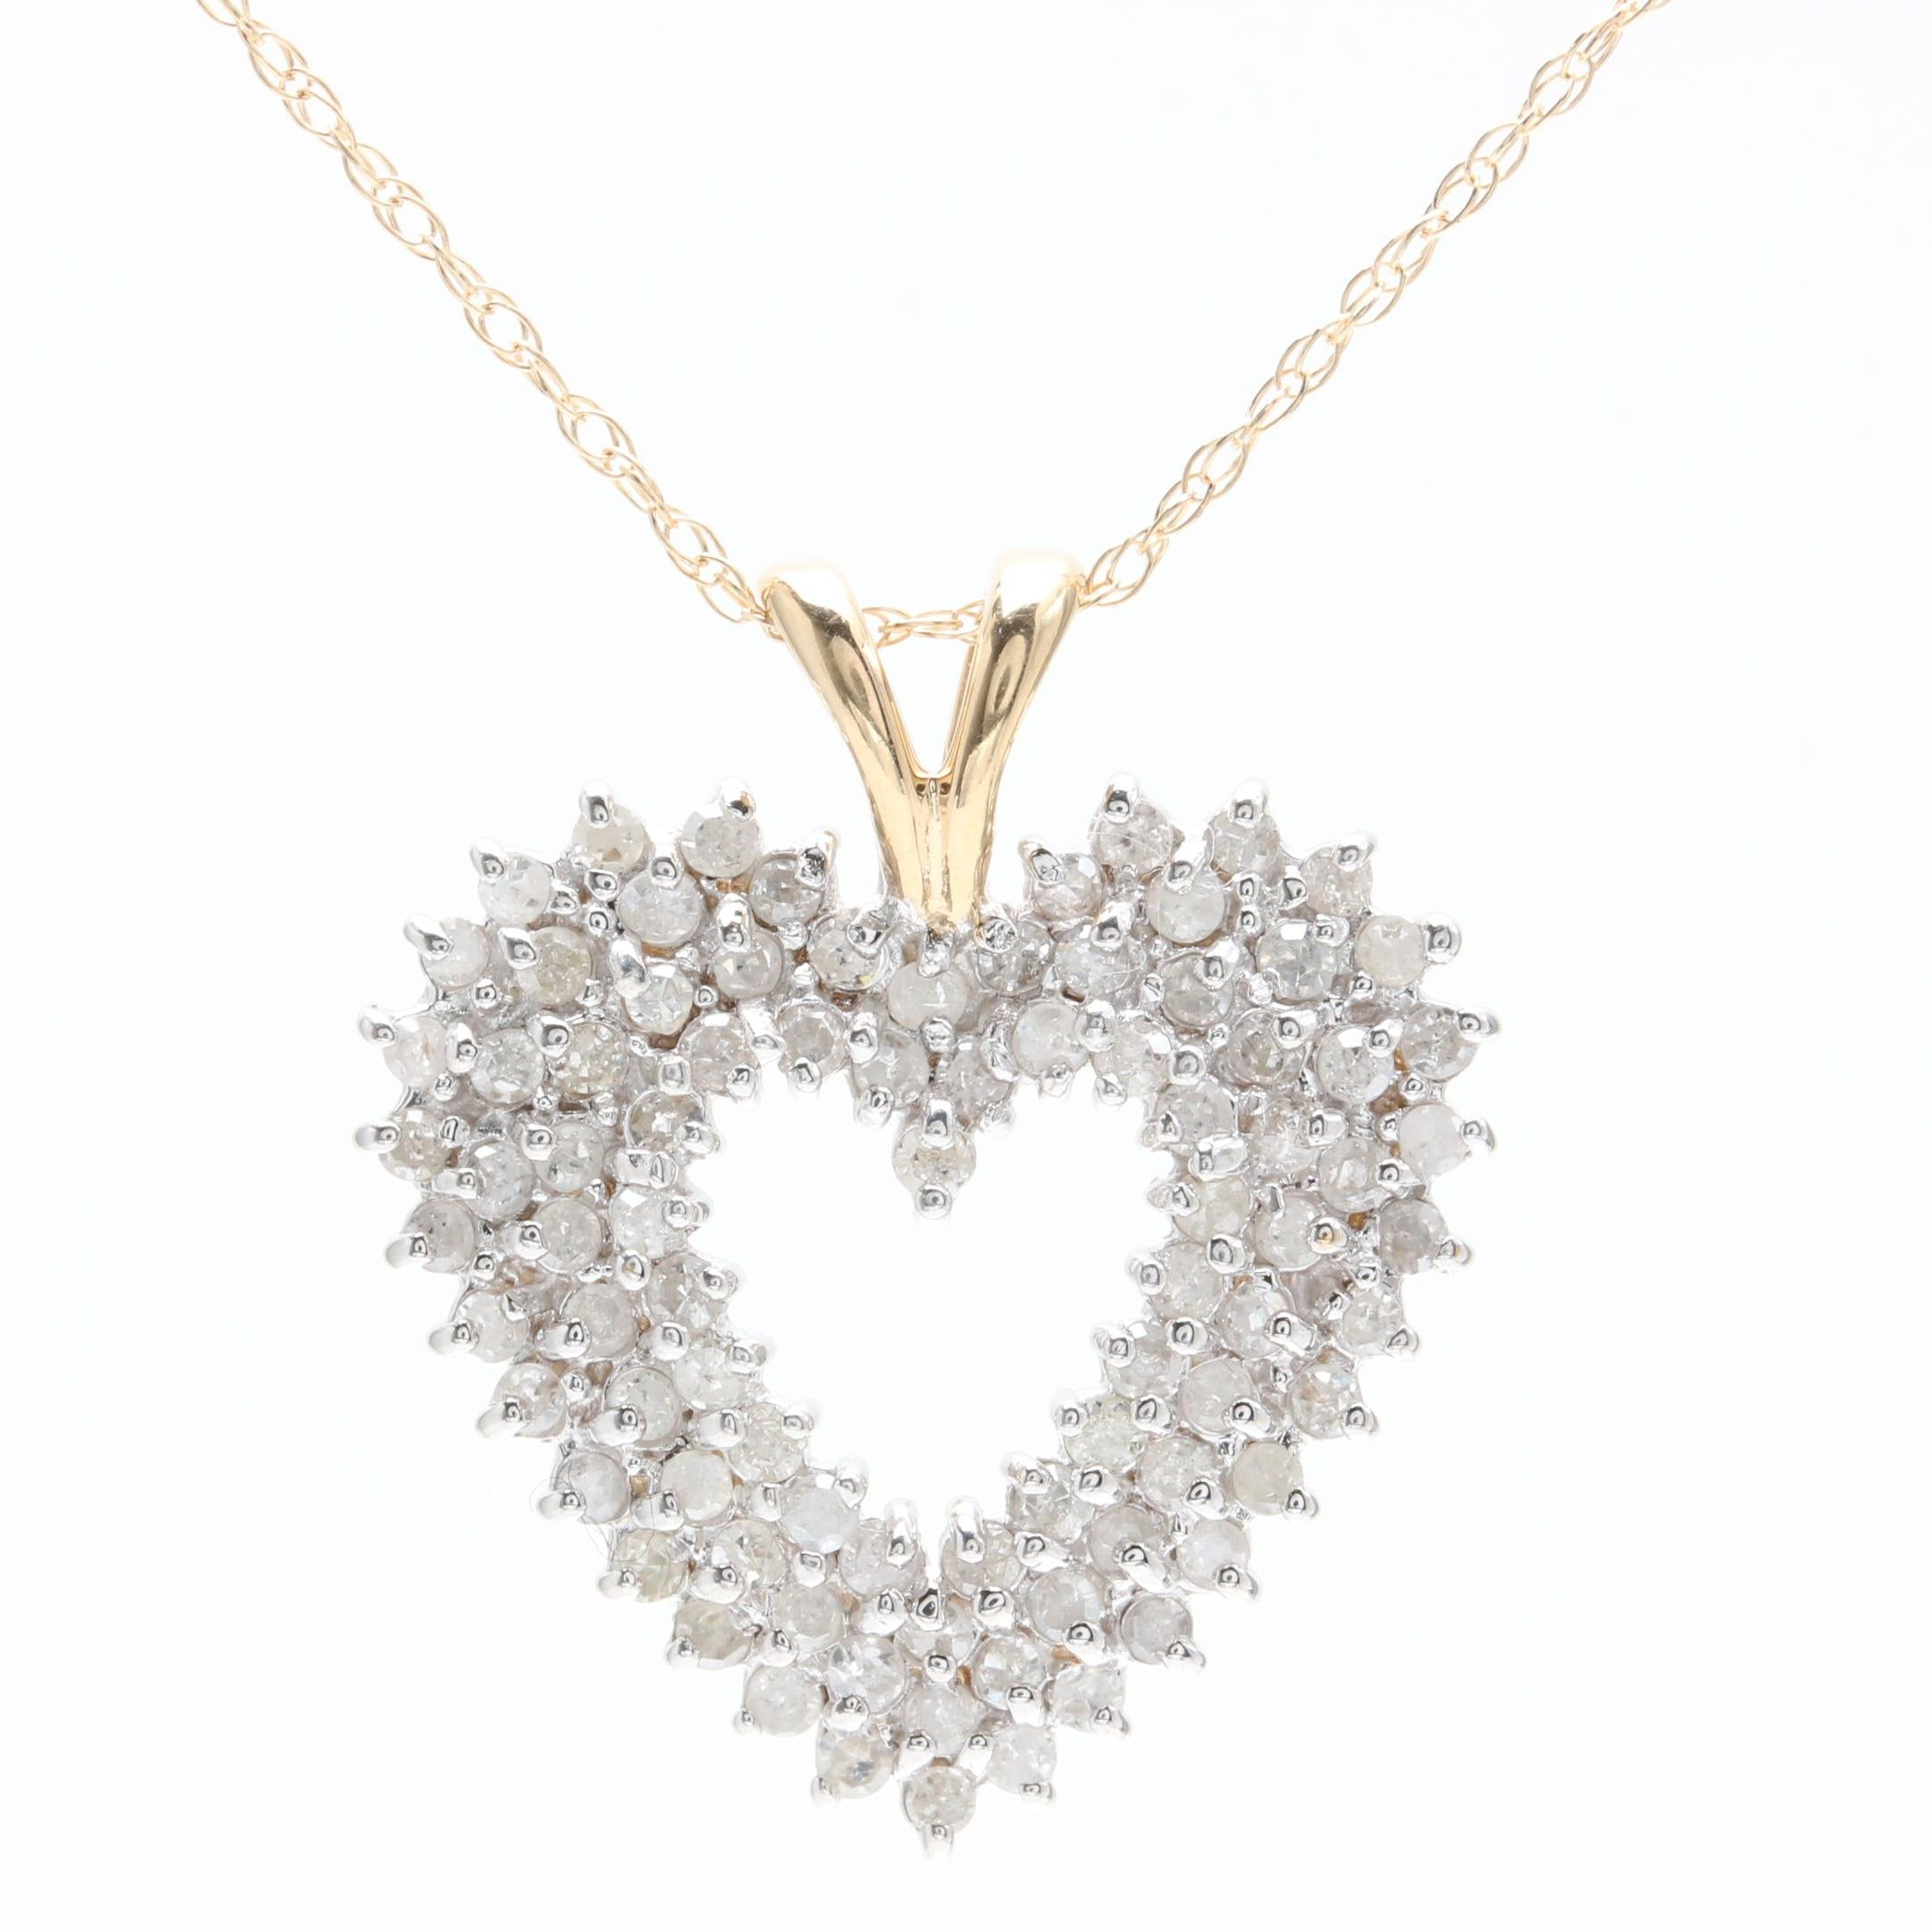 10K Yellow Gold 1.23 CTW Diamond Heart Pendant Necklace